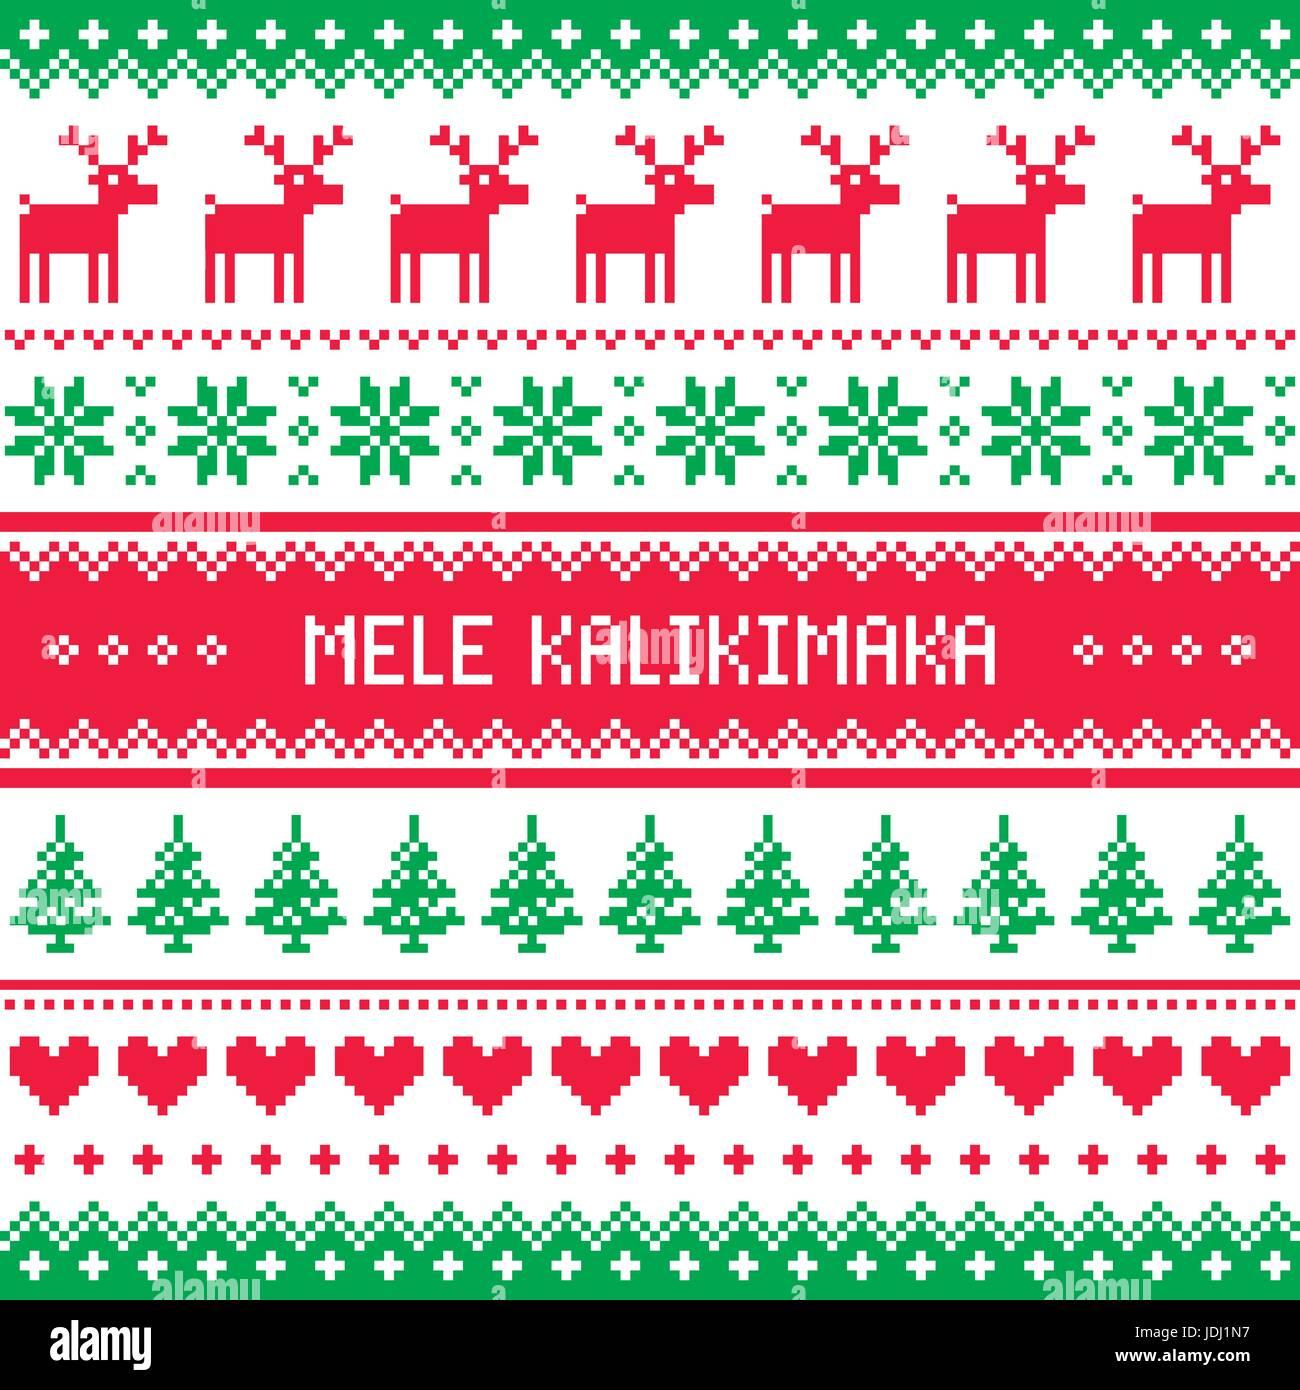 Frohe Weihnachten Hawaii.Mele Kalikimaka Frohe Weihnachten In Hawaii Grußkarte Nahtlose